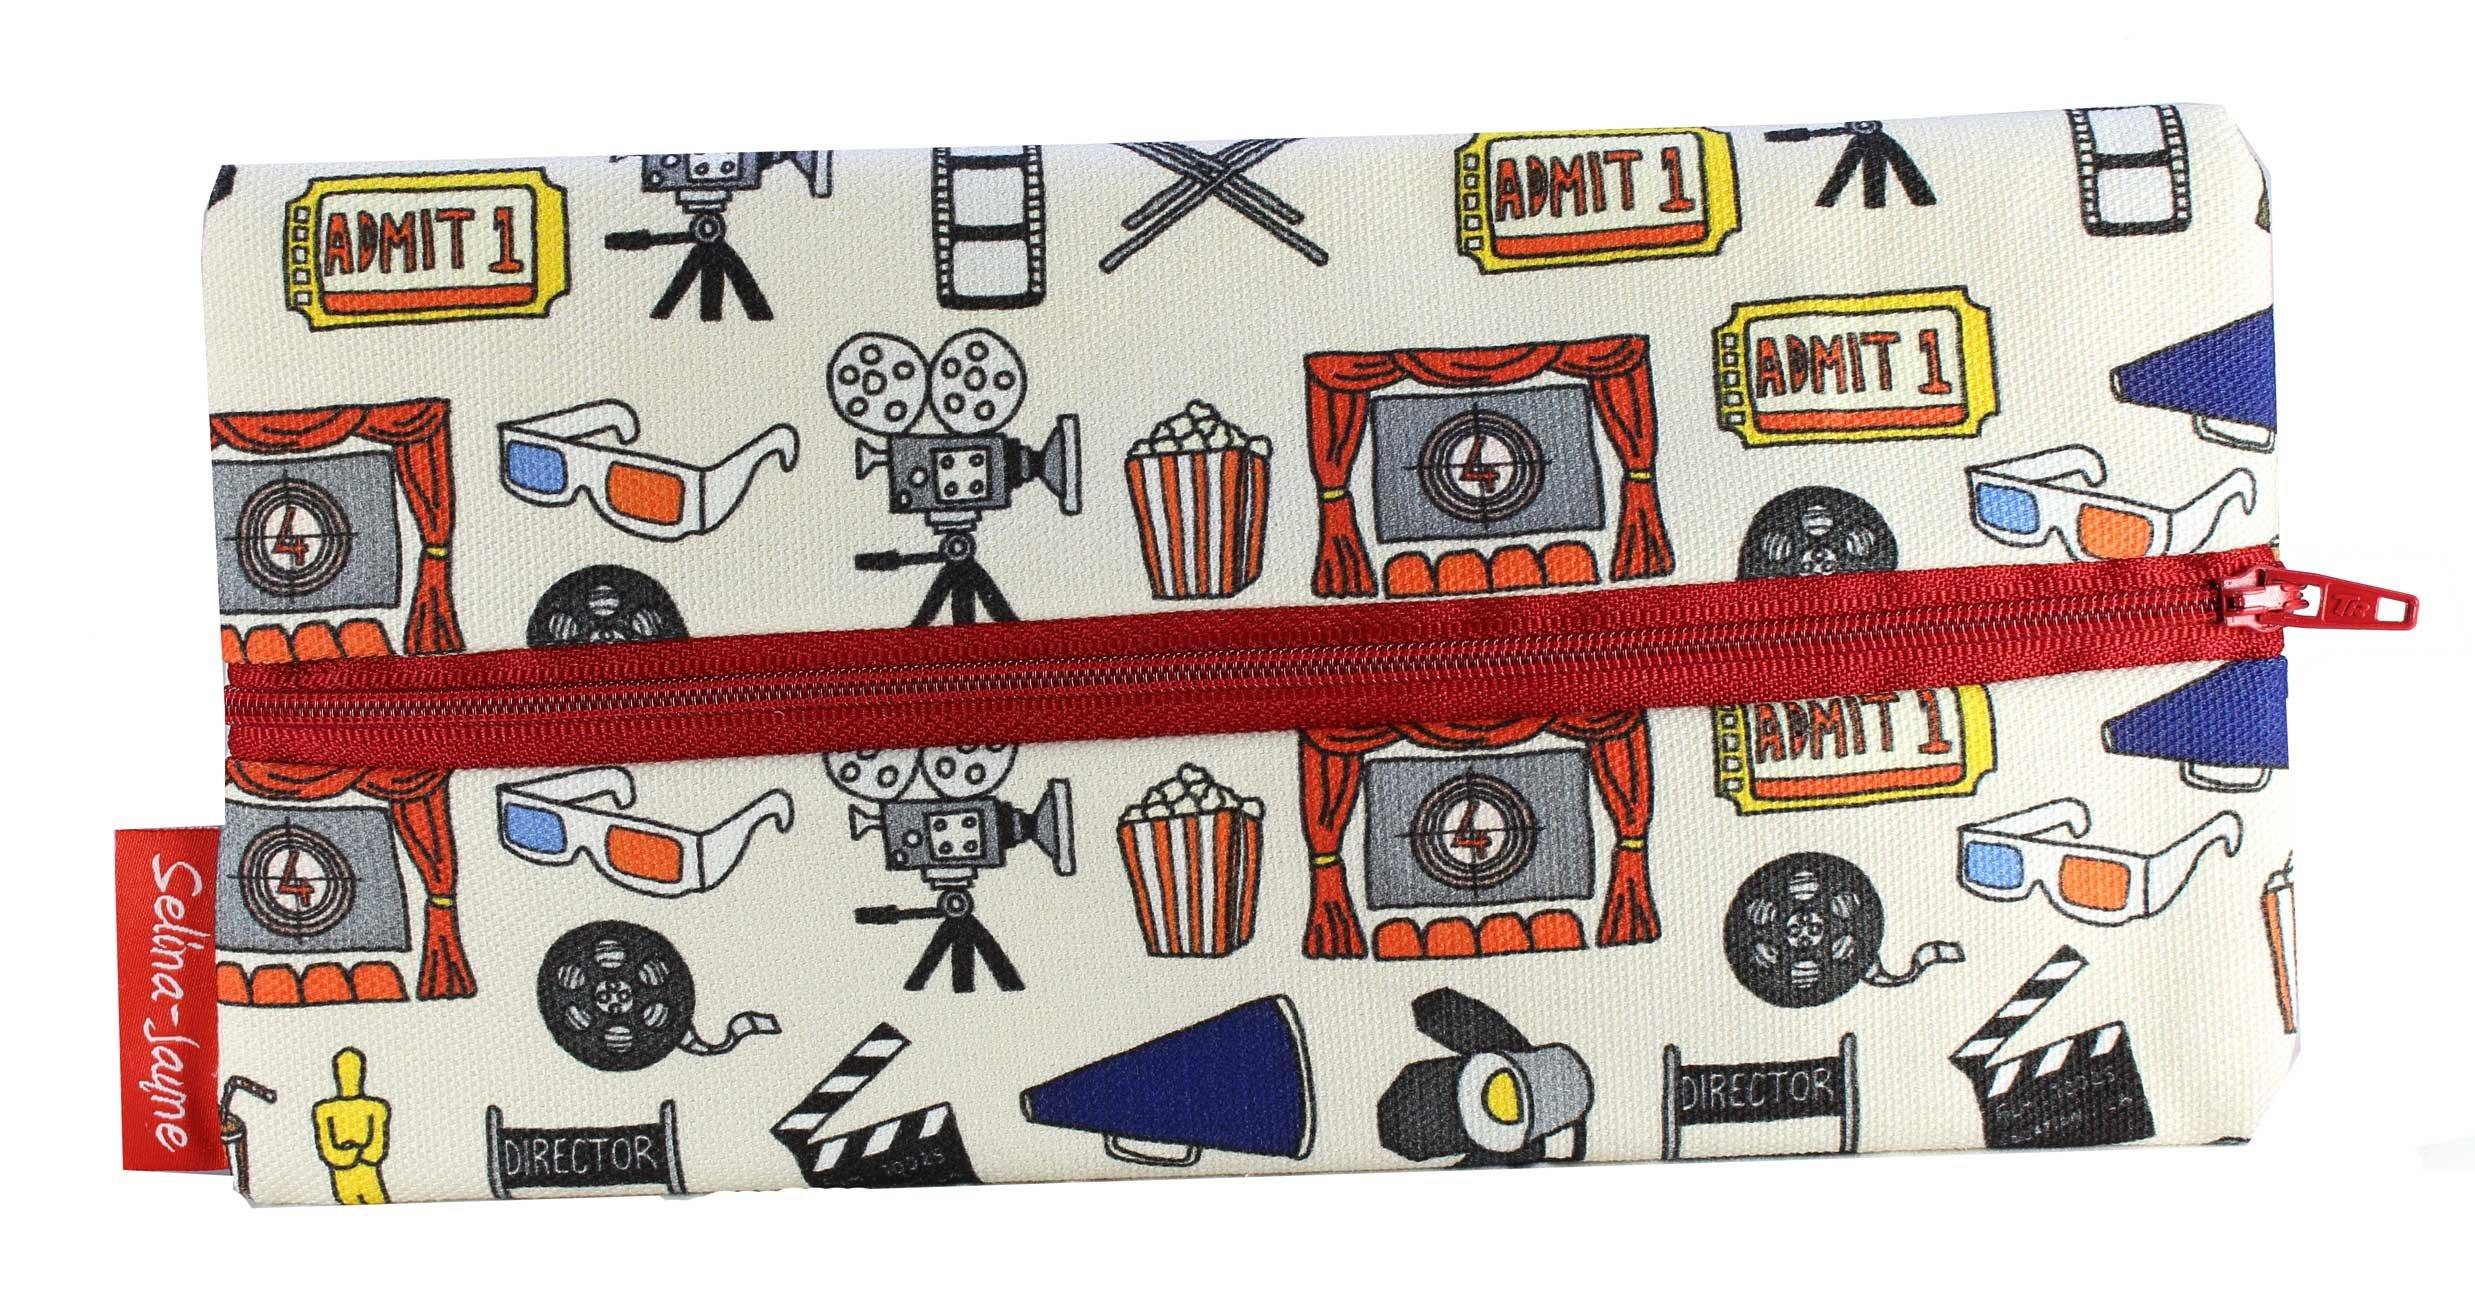 Selina-Jayne Movies Limited Edition Designer Pencil Case